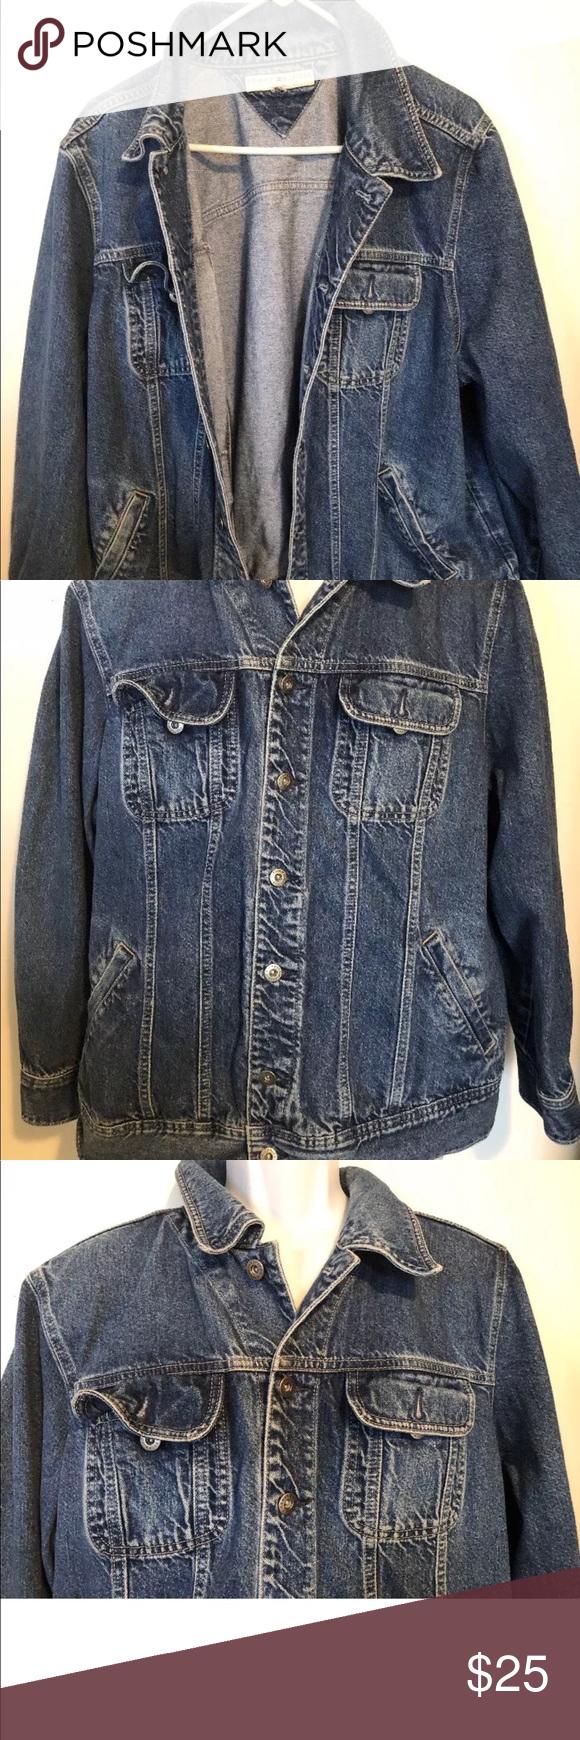 Tommy Hilfiger Womens 2X Denim jean jacket Blue You are